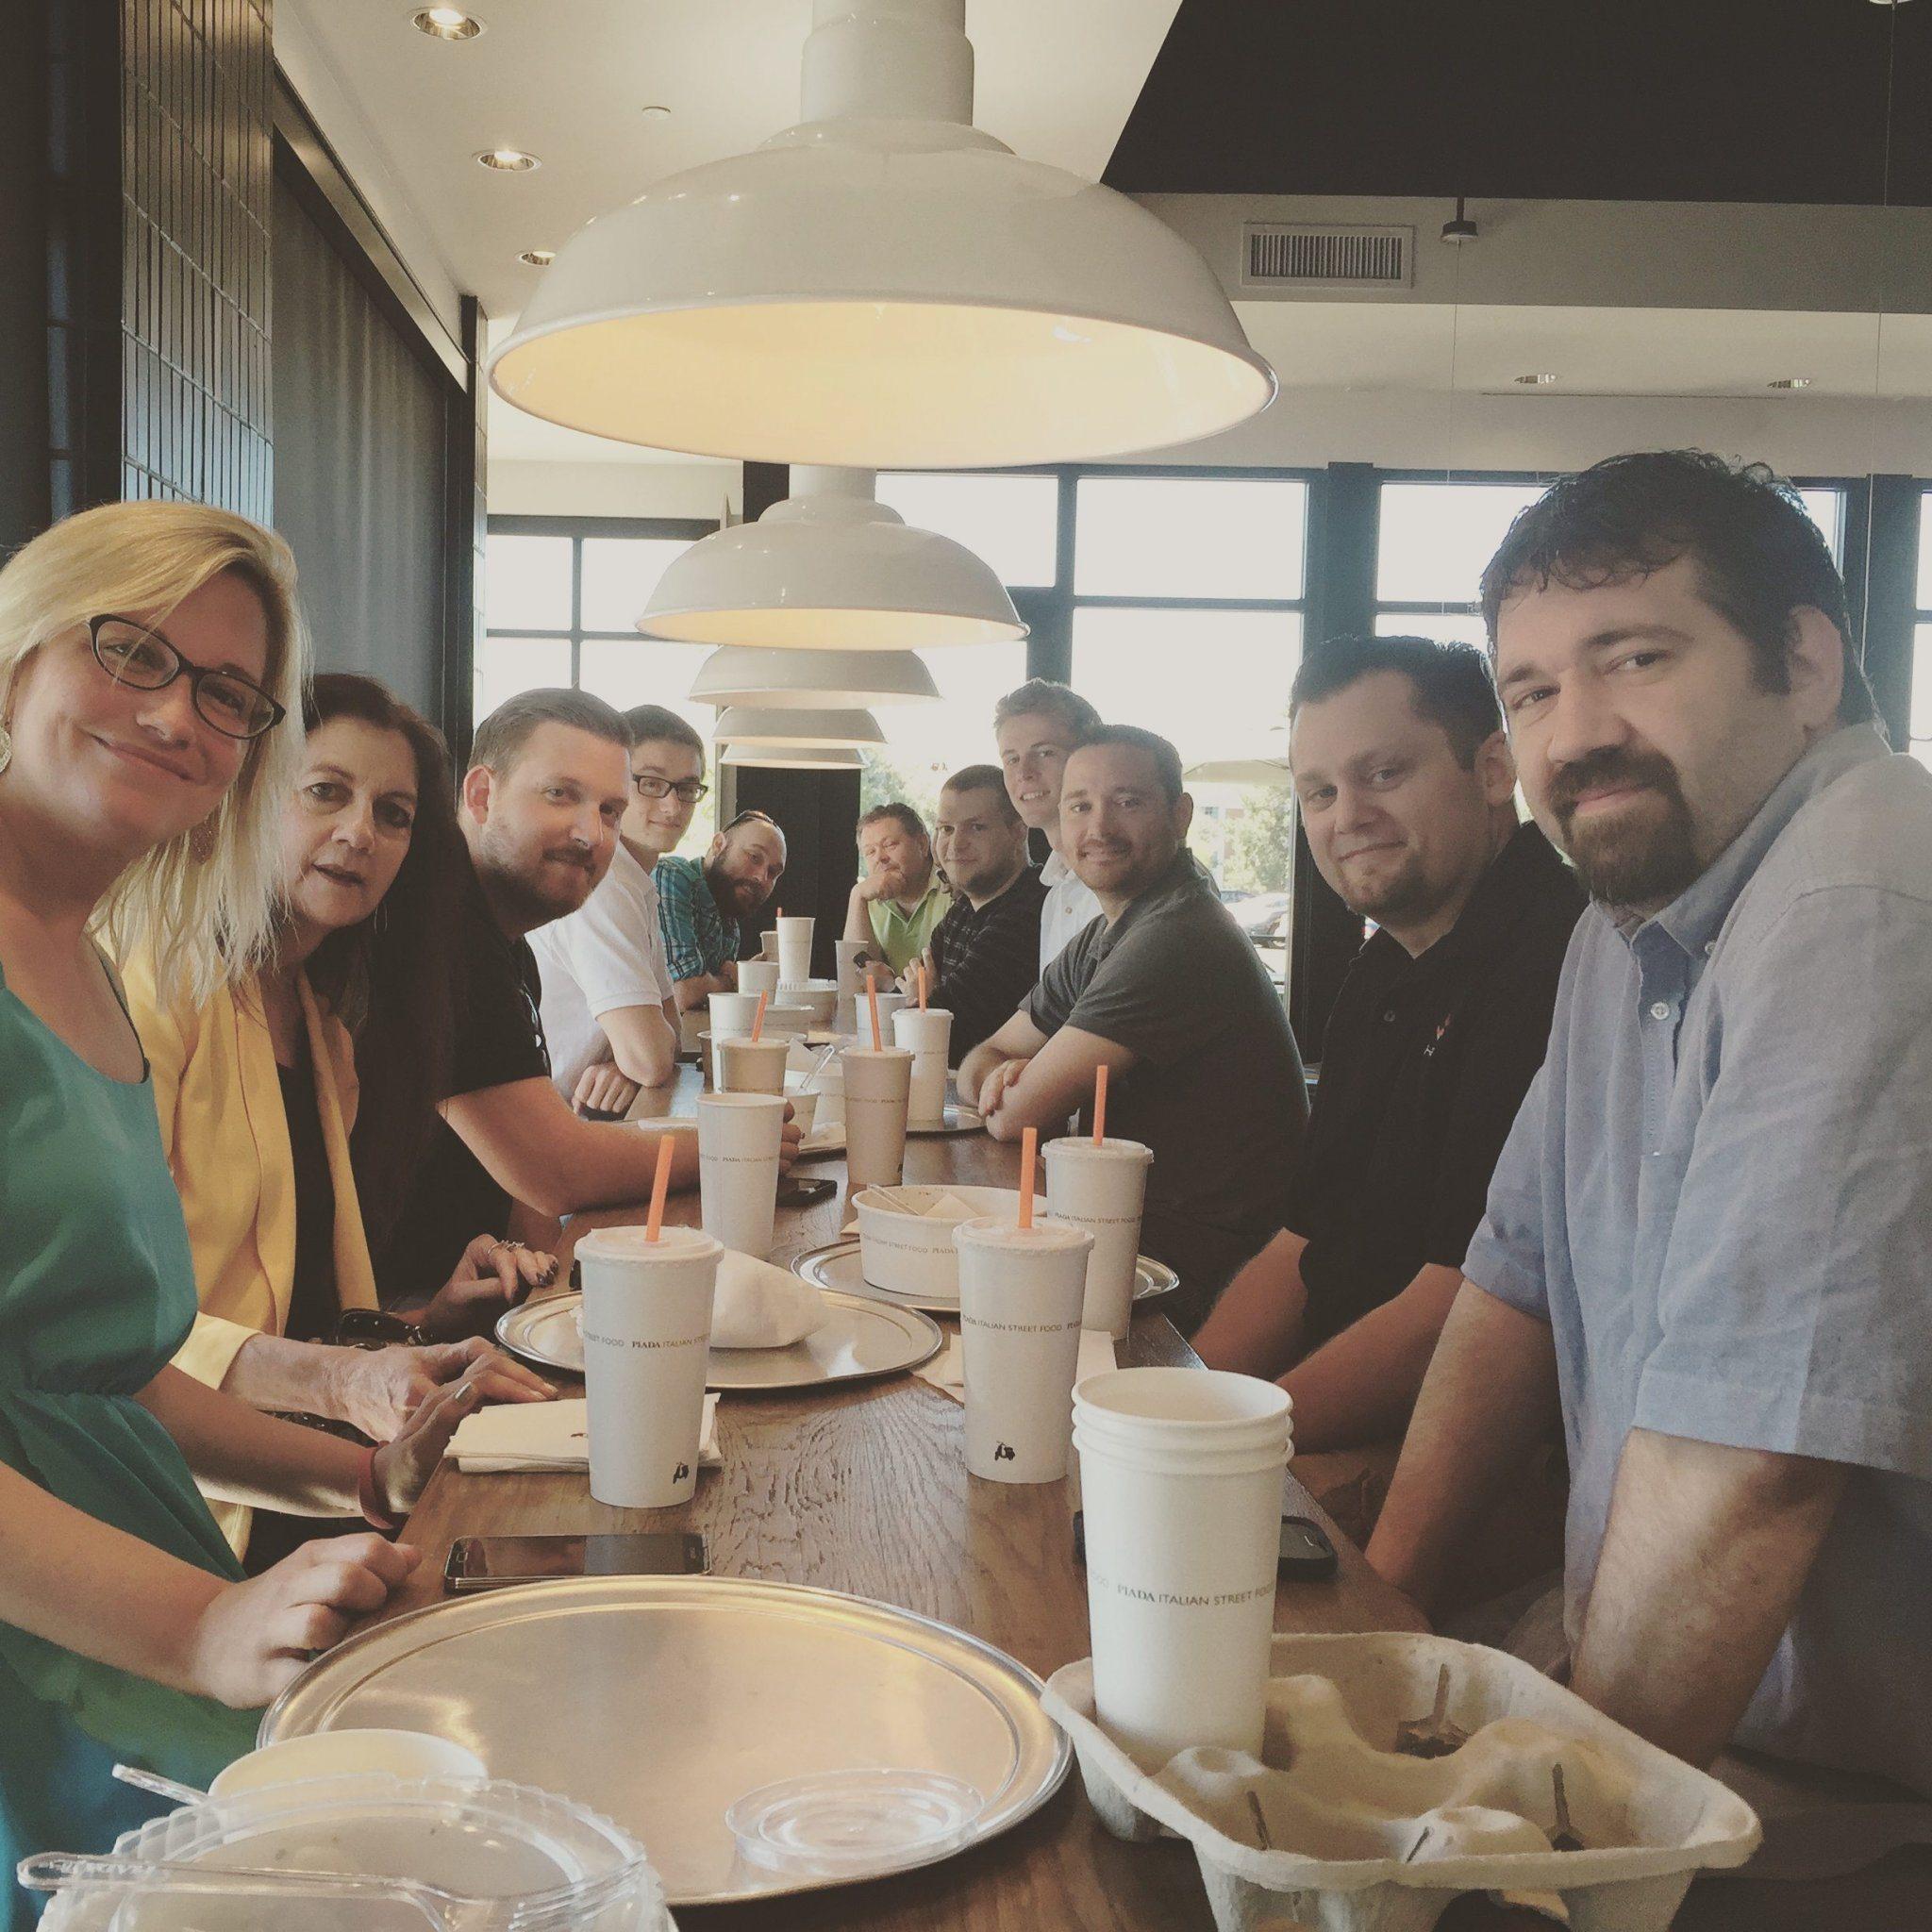 Chepri dines at Piada Worthington